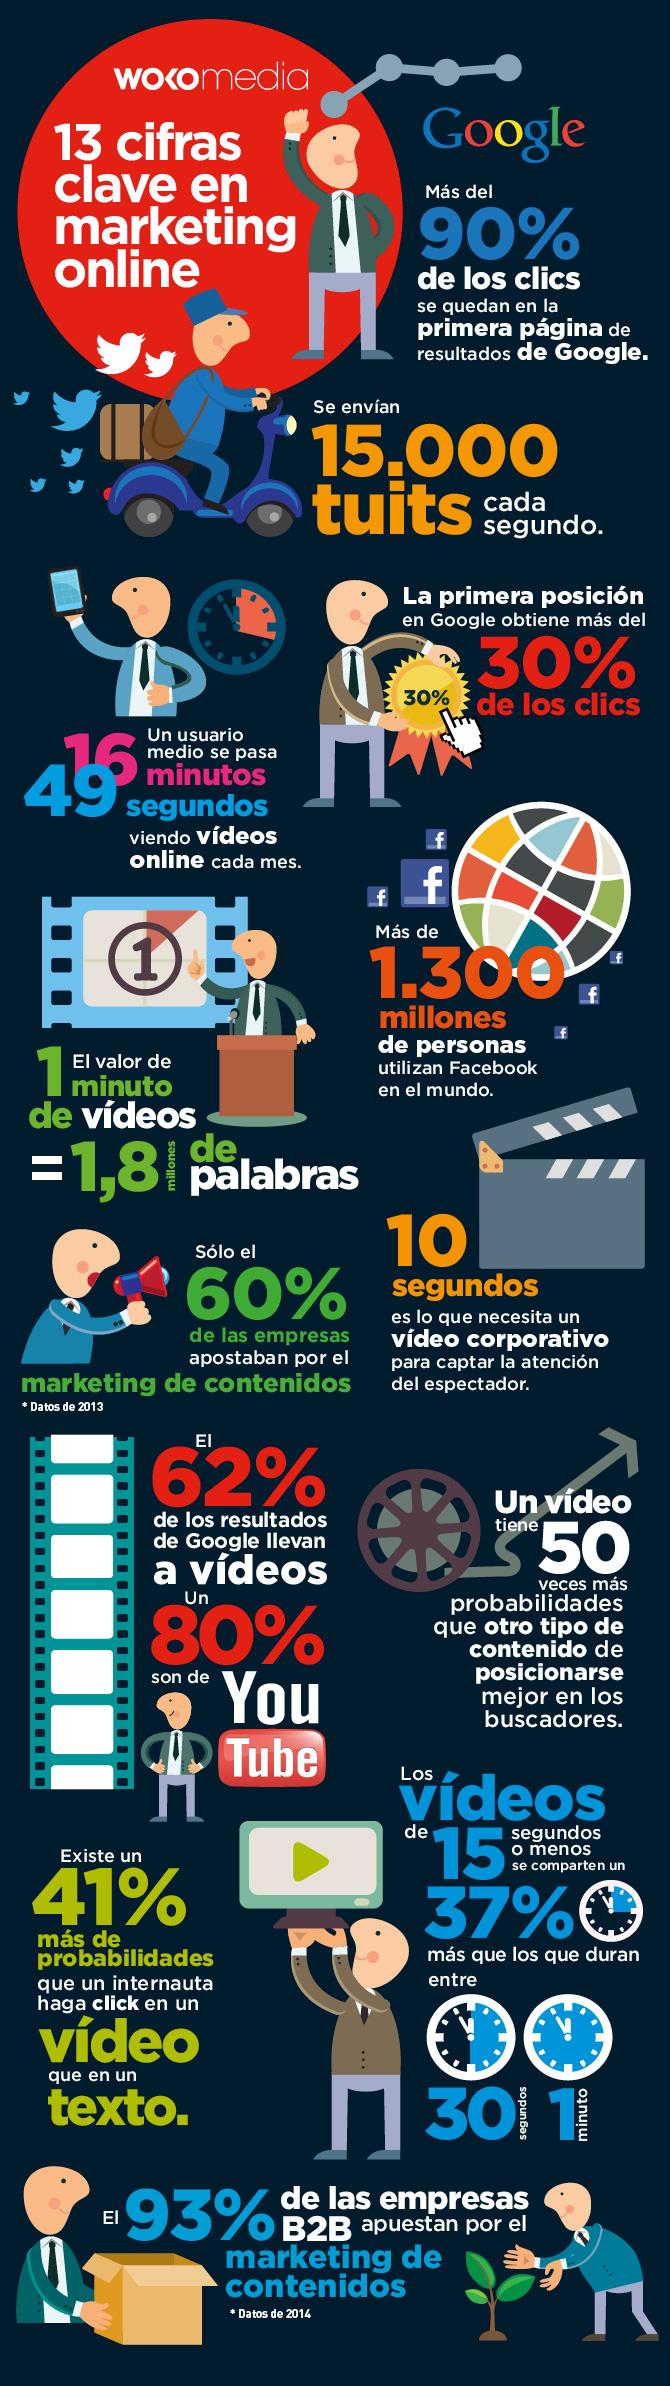 13 cifras clave en Marketing online